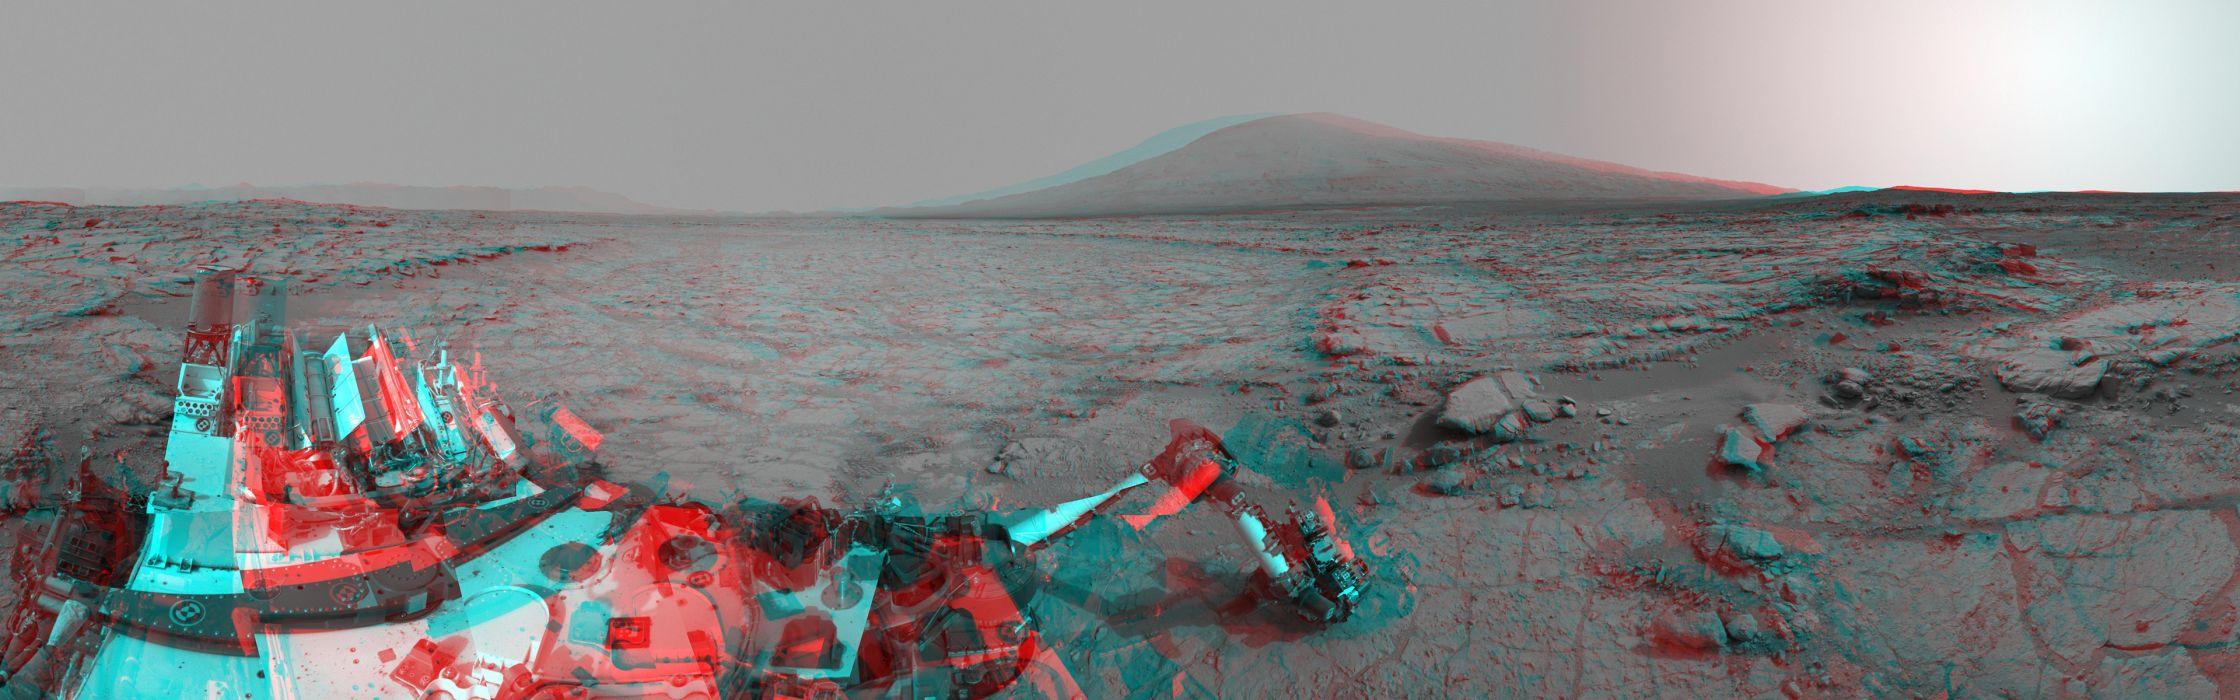 Curiosity Mars Rover Alien Landscape Machine NASA 3D multi dual science sci sci-fi planets wallpaper